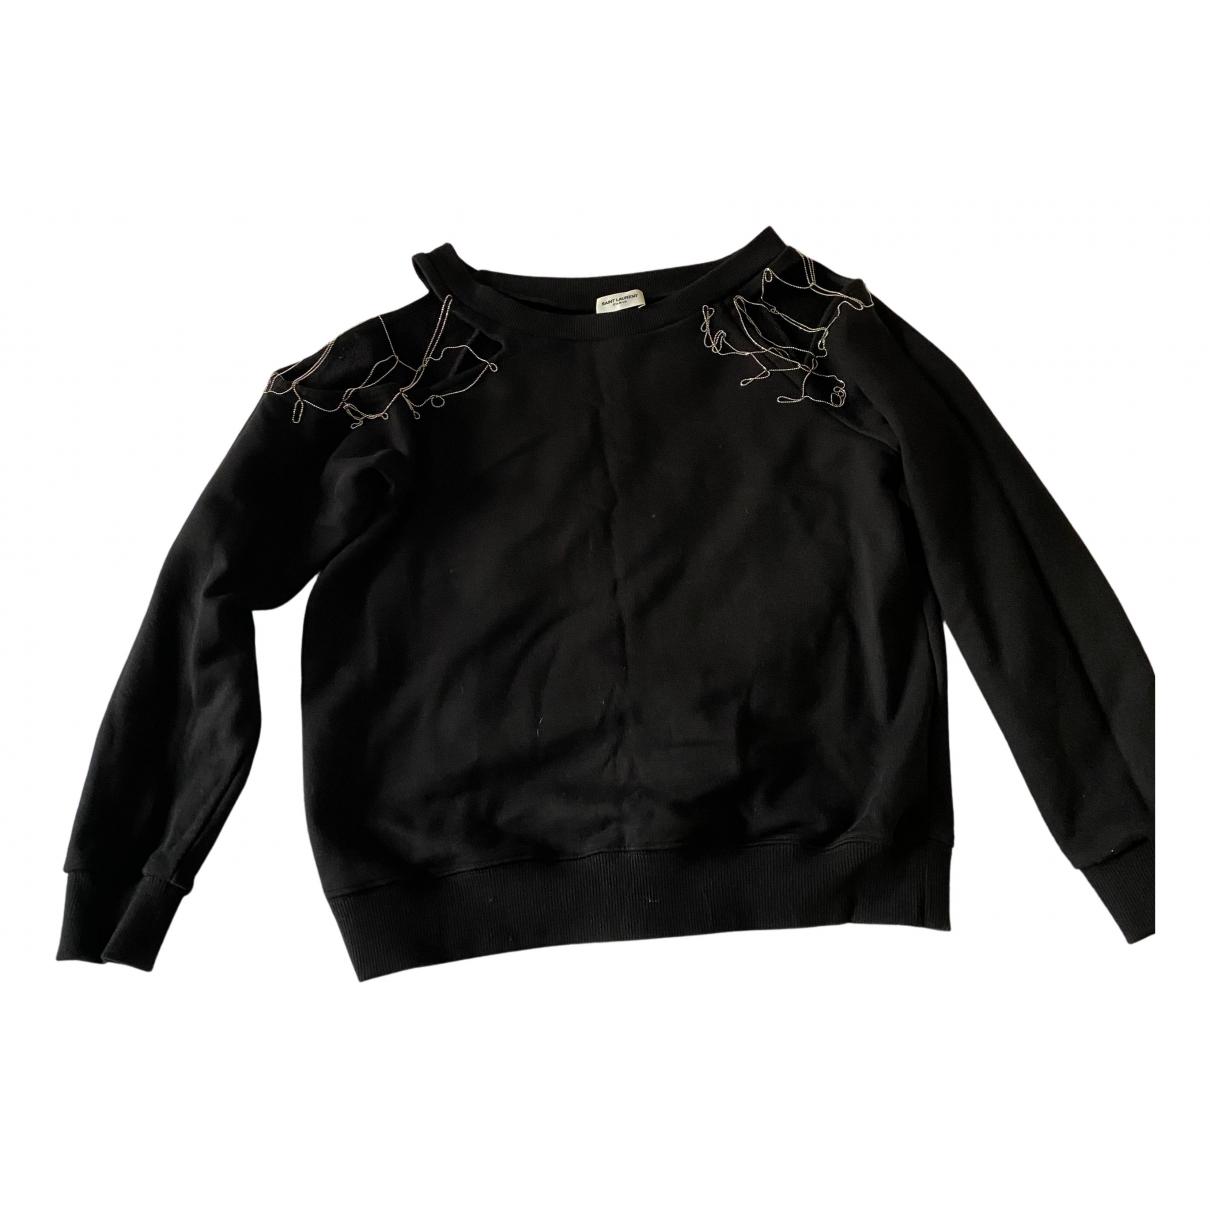 Saint Laurent N Black Cotton Knitwear for Women 38 FR